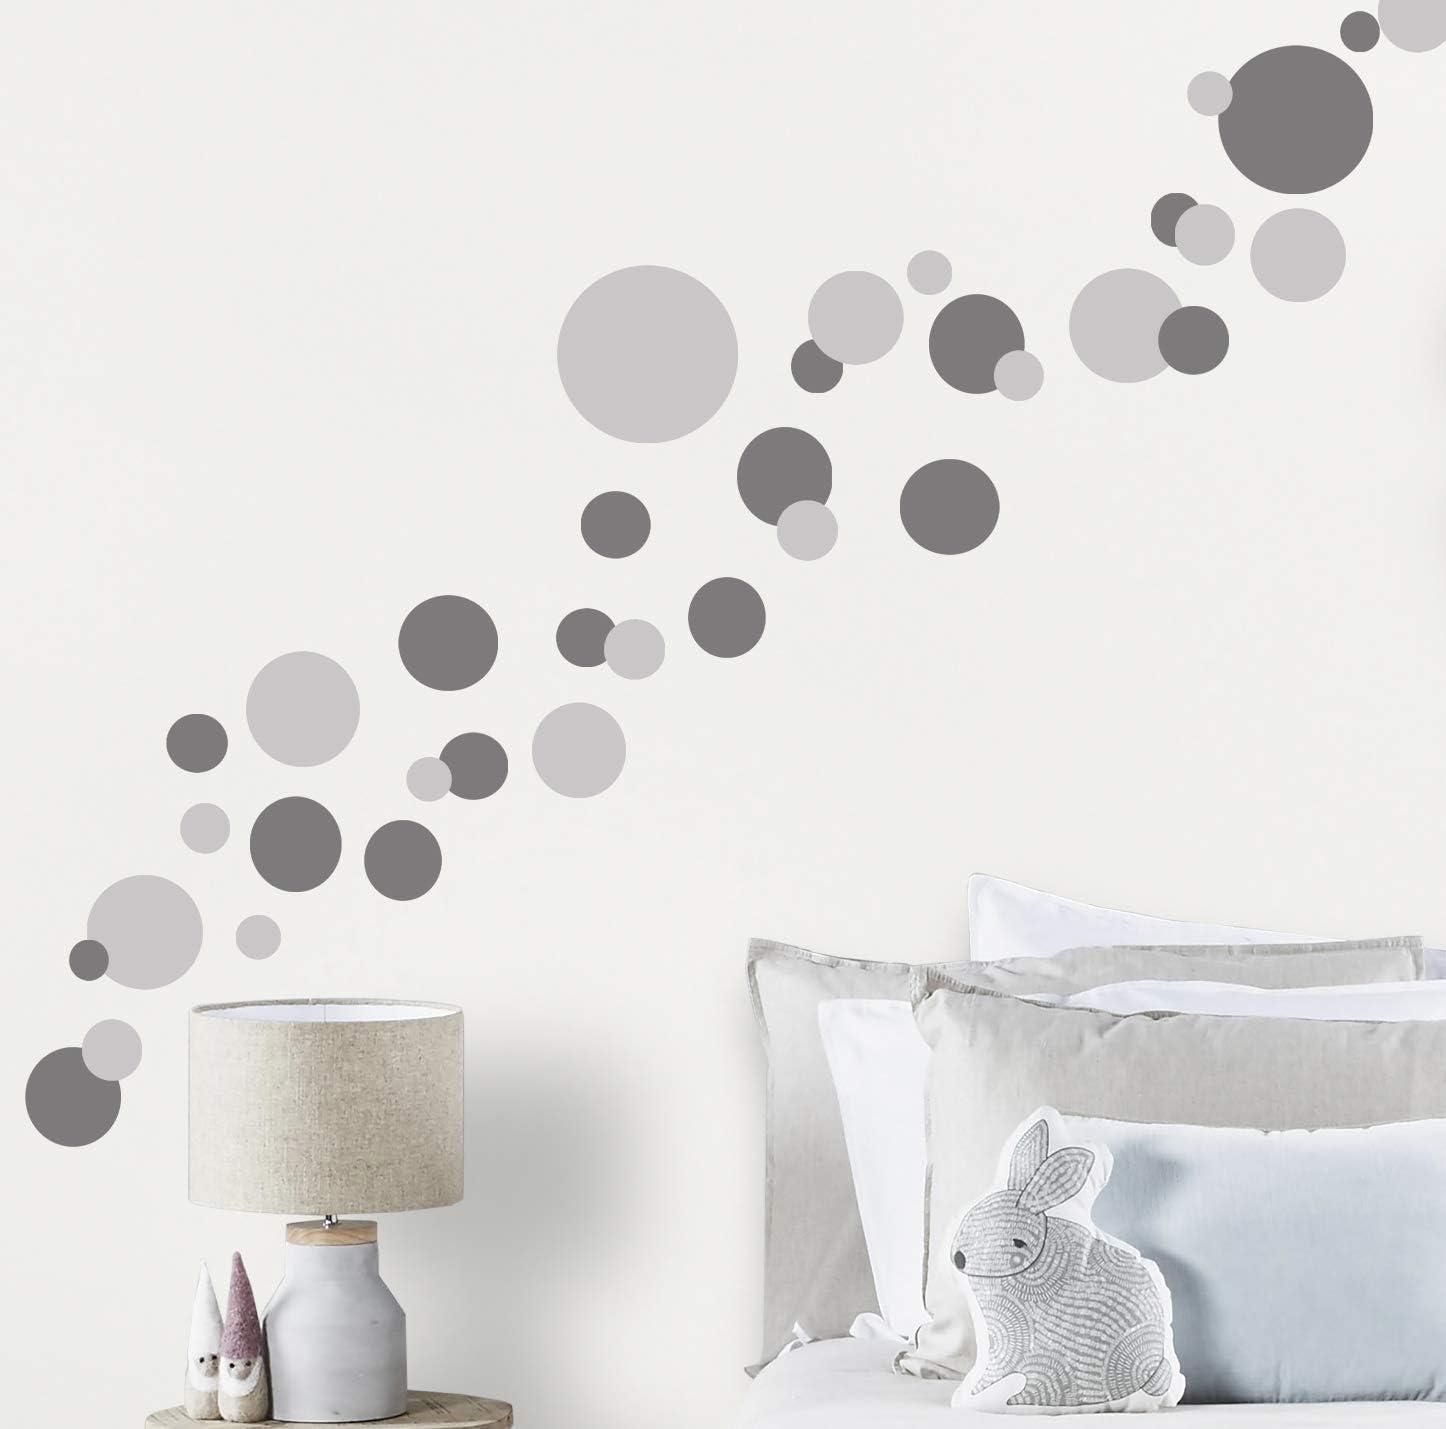 Wall Decor Dots, Polka Dot Wall Decals for Girls Room Walls Decor Stickers Bedroom Kids Art (Dark & Light Grey)